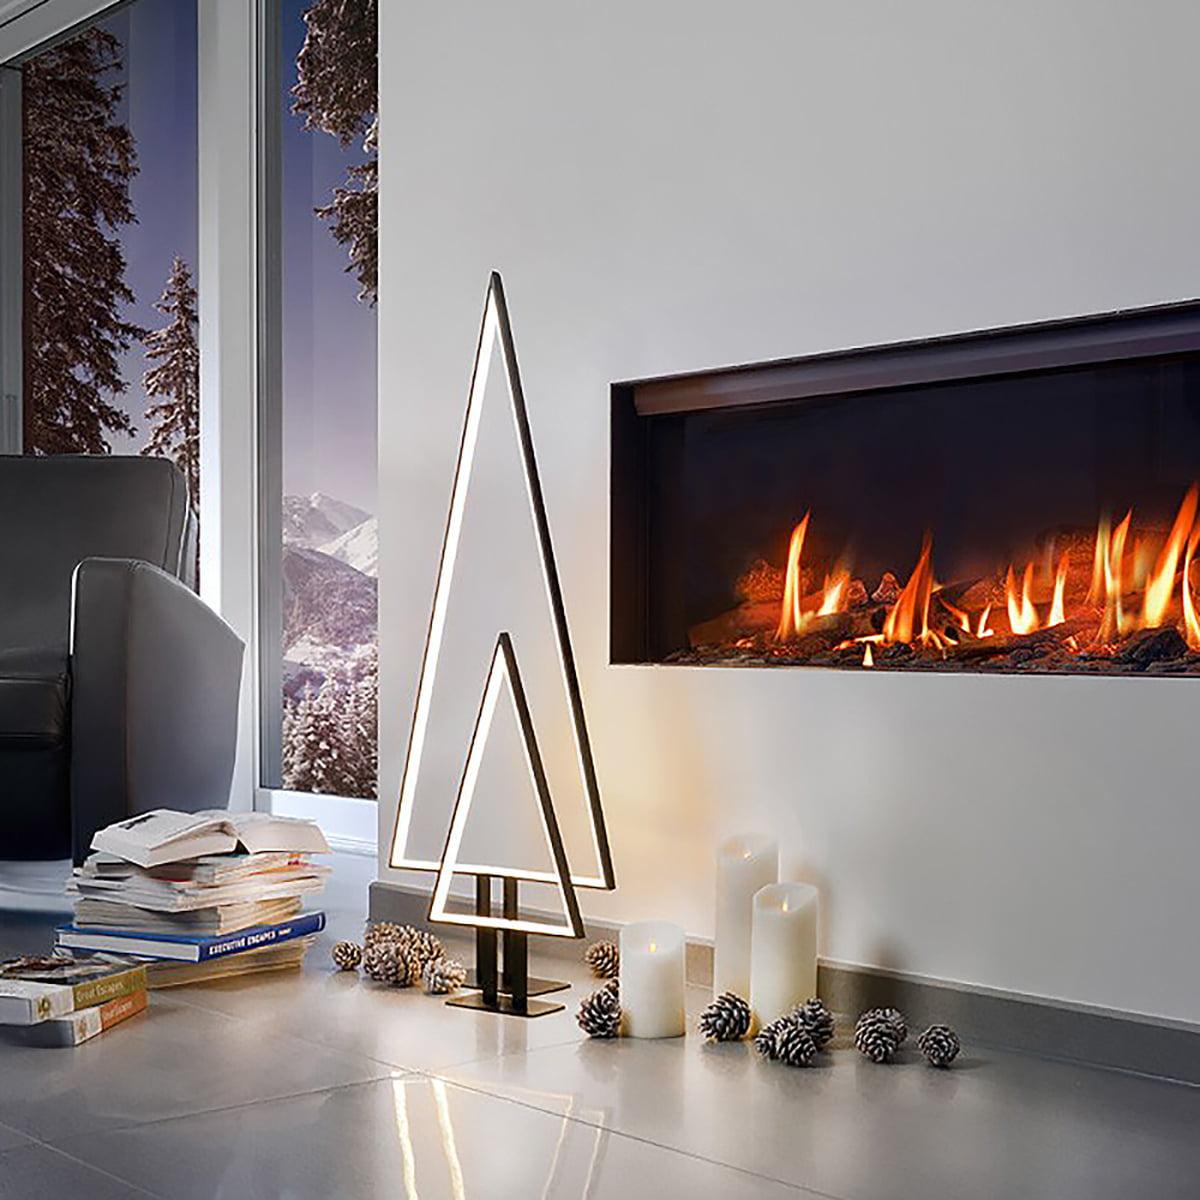 Lampe de table led pine par sompex en ligne - Designer weihnachtsdeko ...